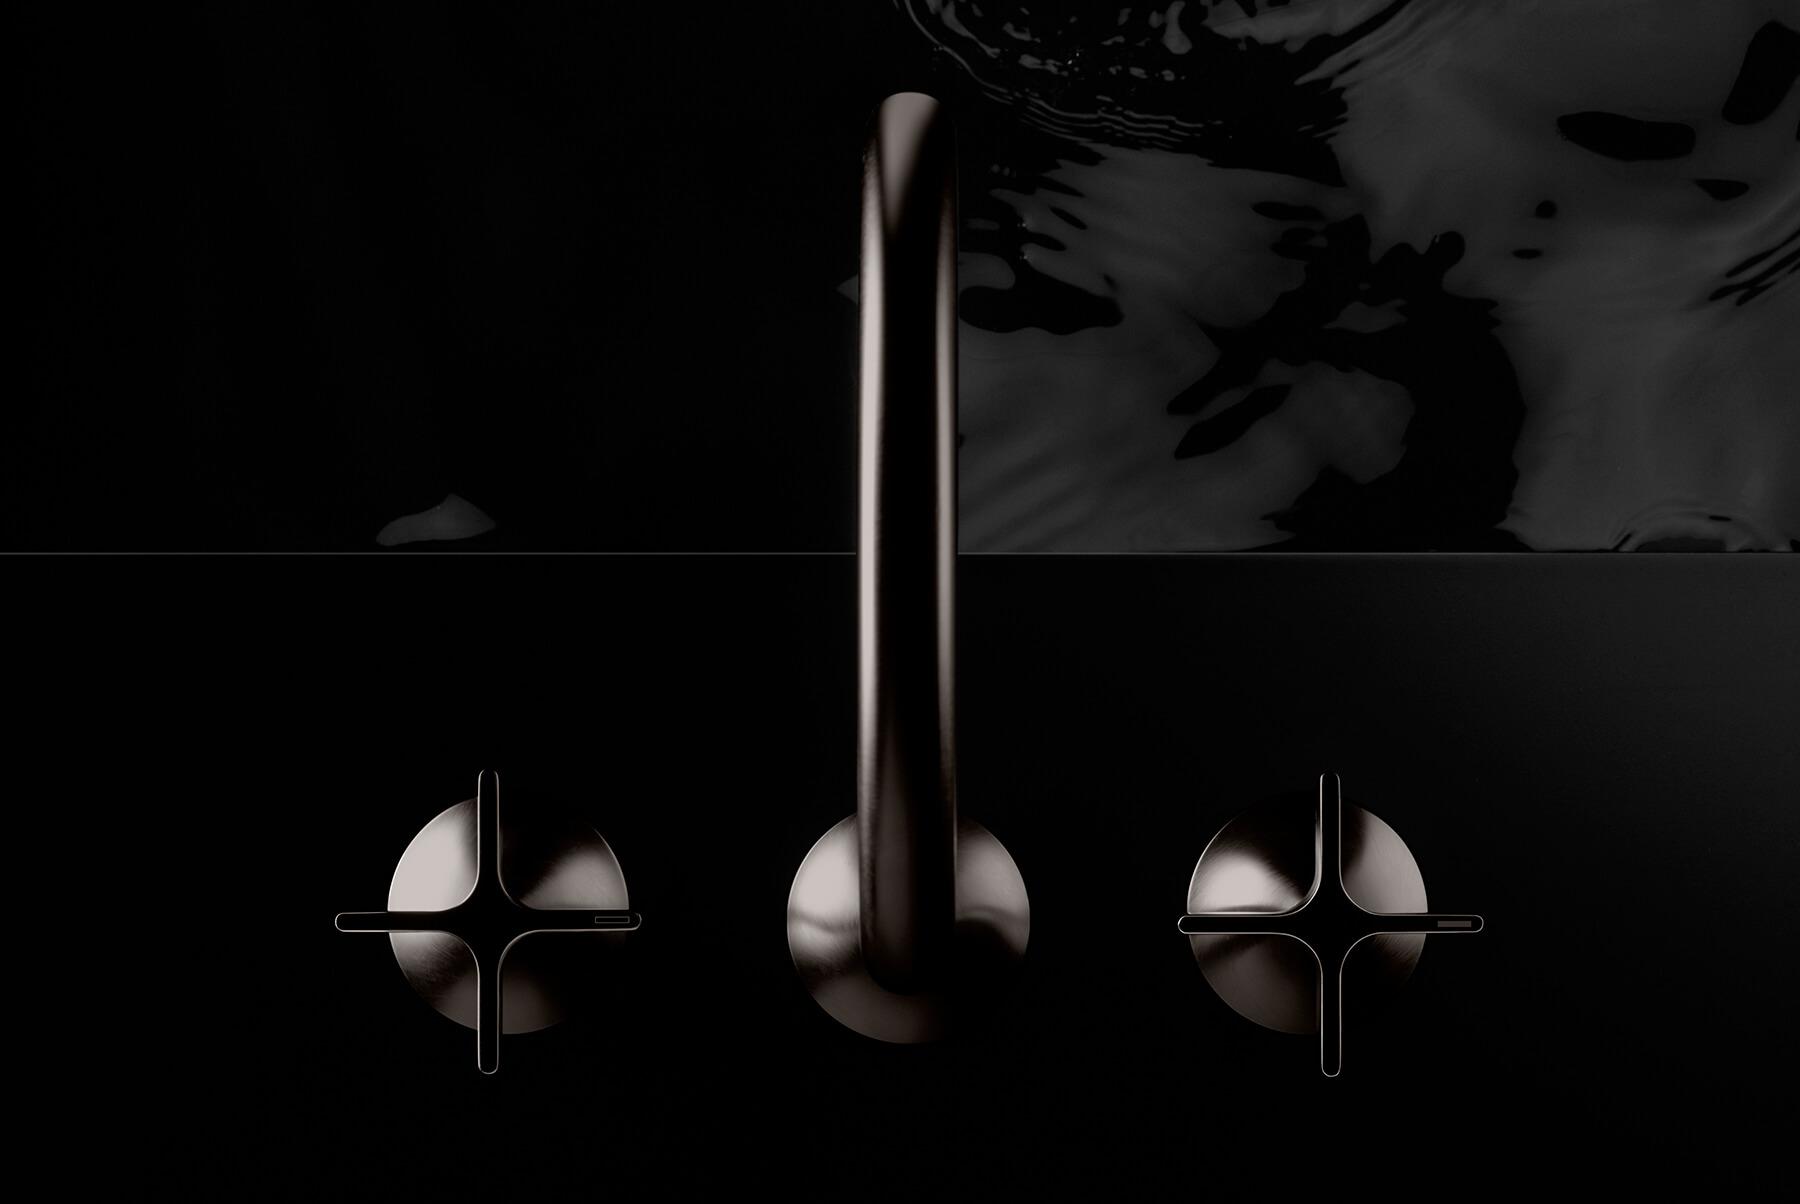 Brassware-Dornbracht-Vaia-Inset-2-1800x1204